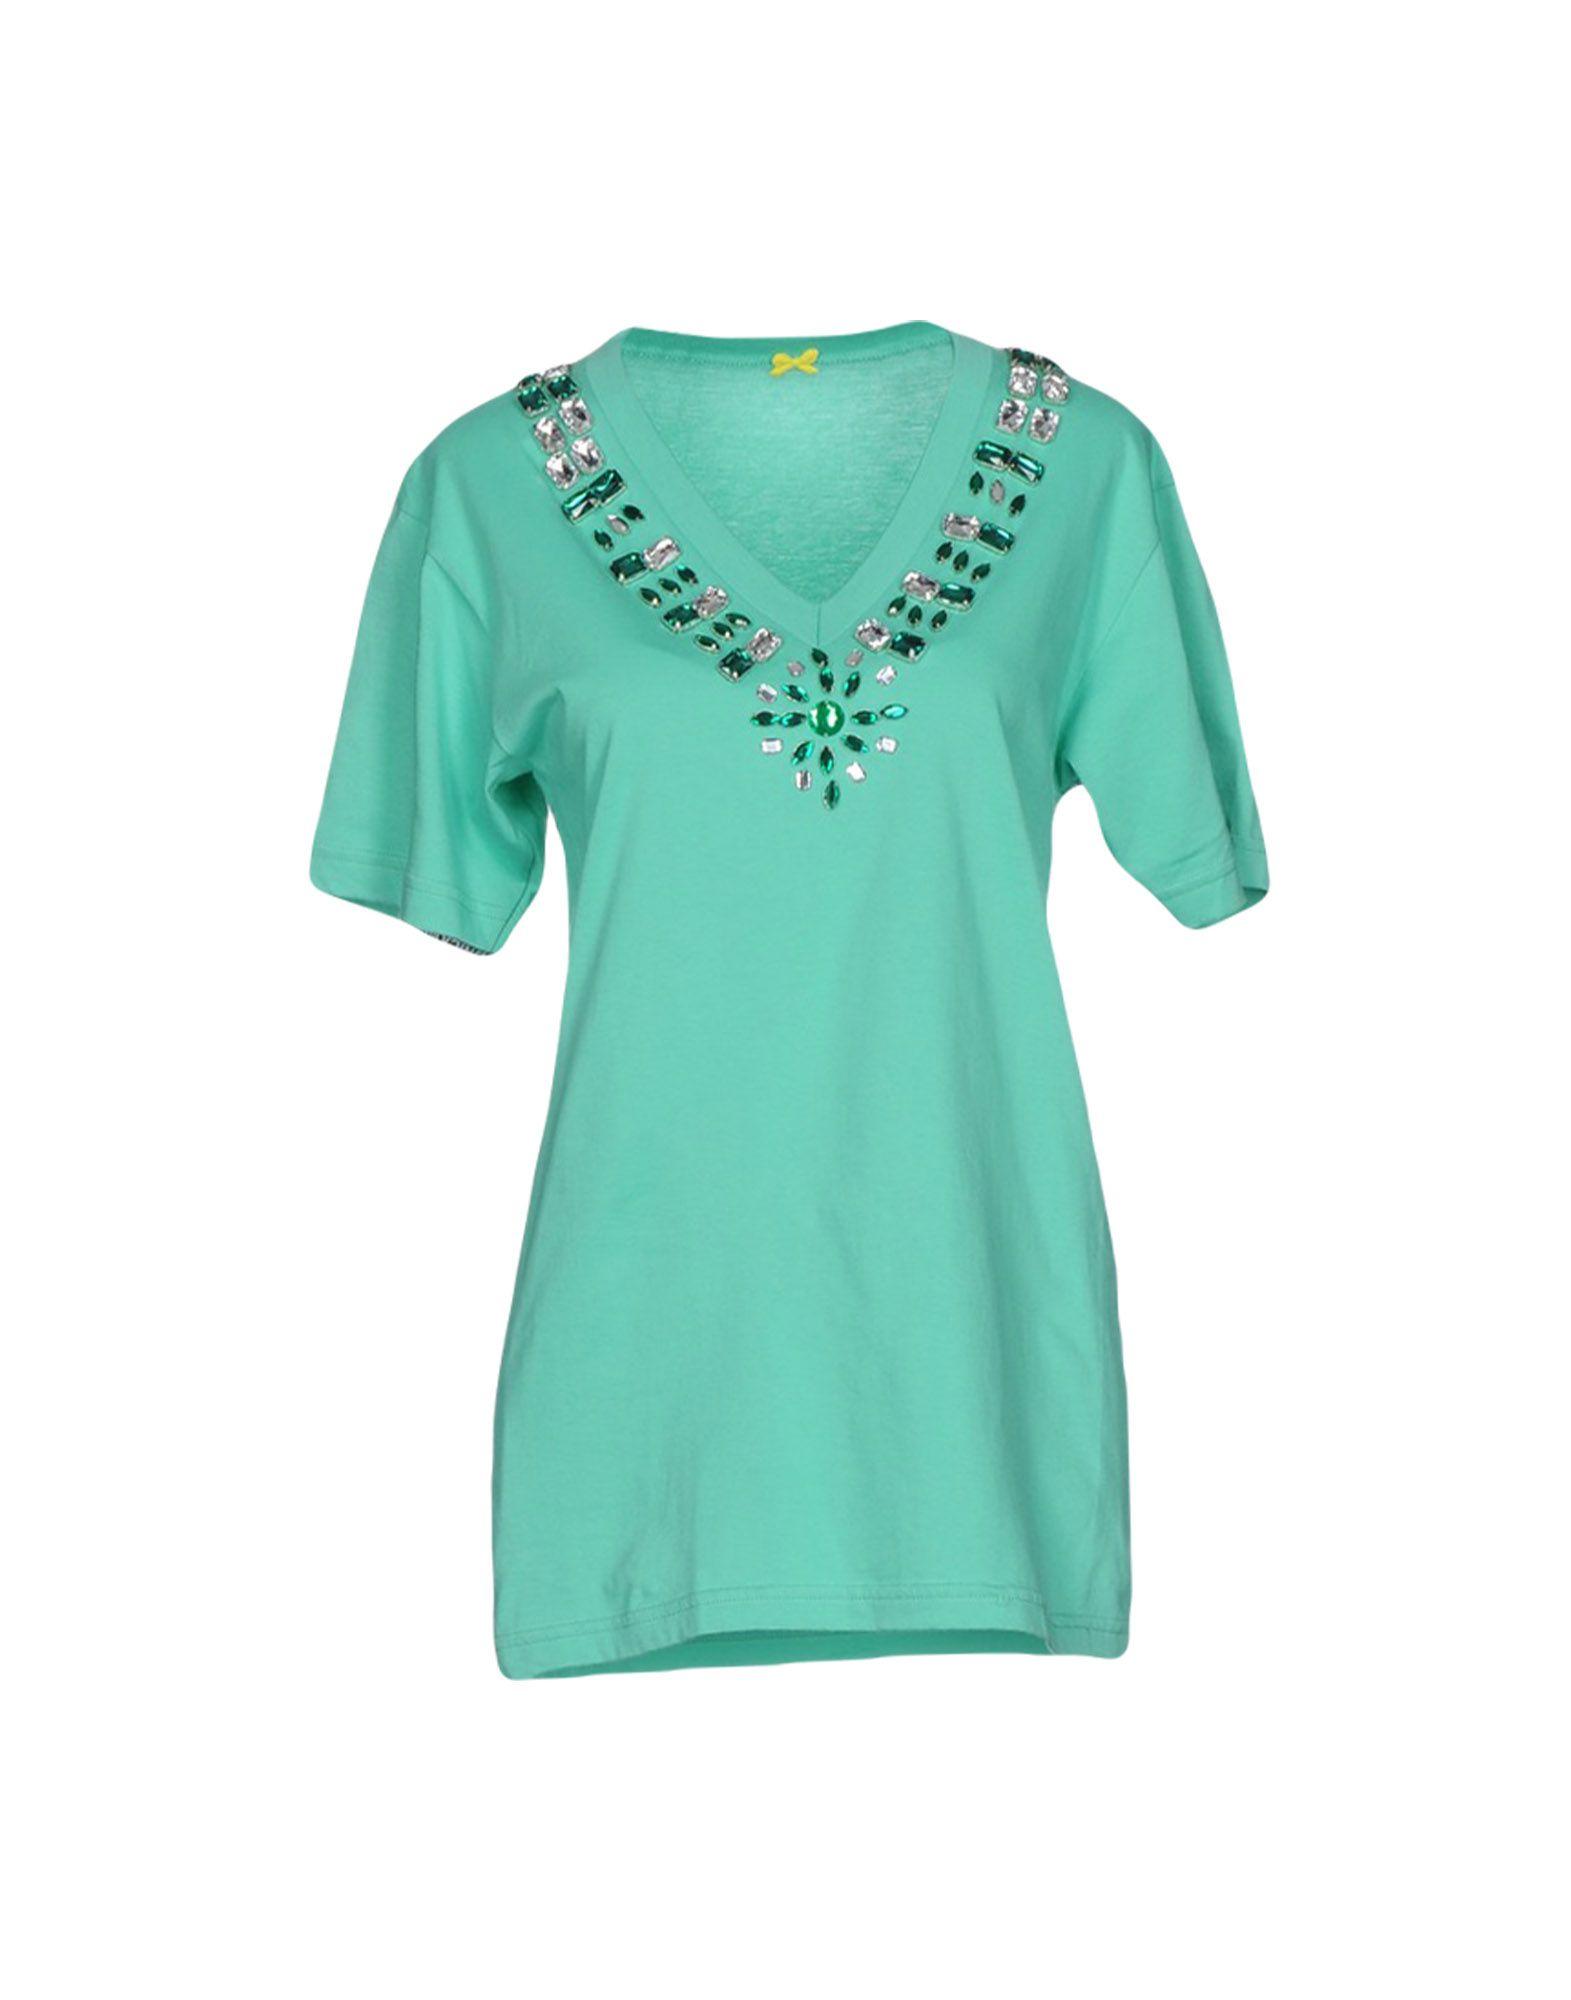 MONICA BIANCO Damen T-shirts Farbe Grün Größe 4